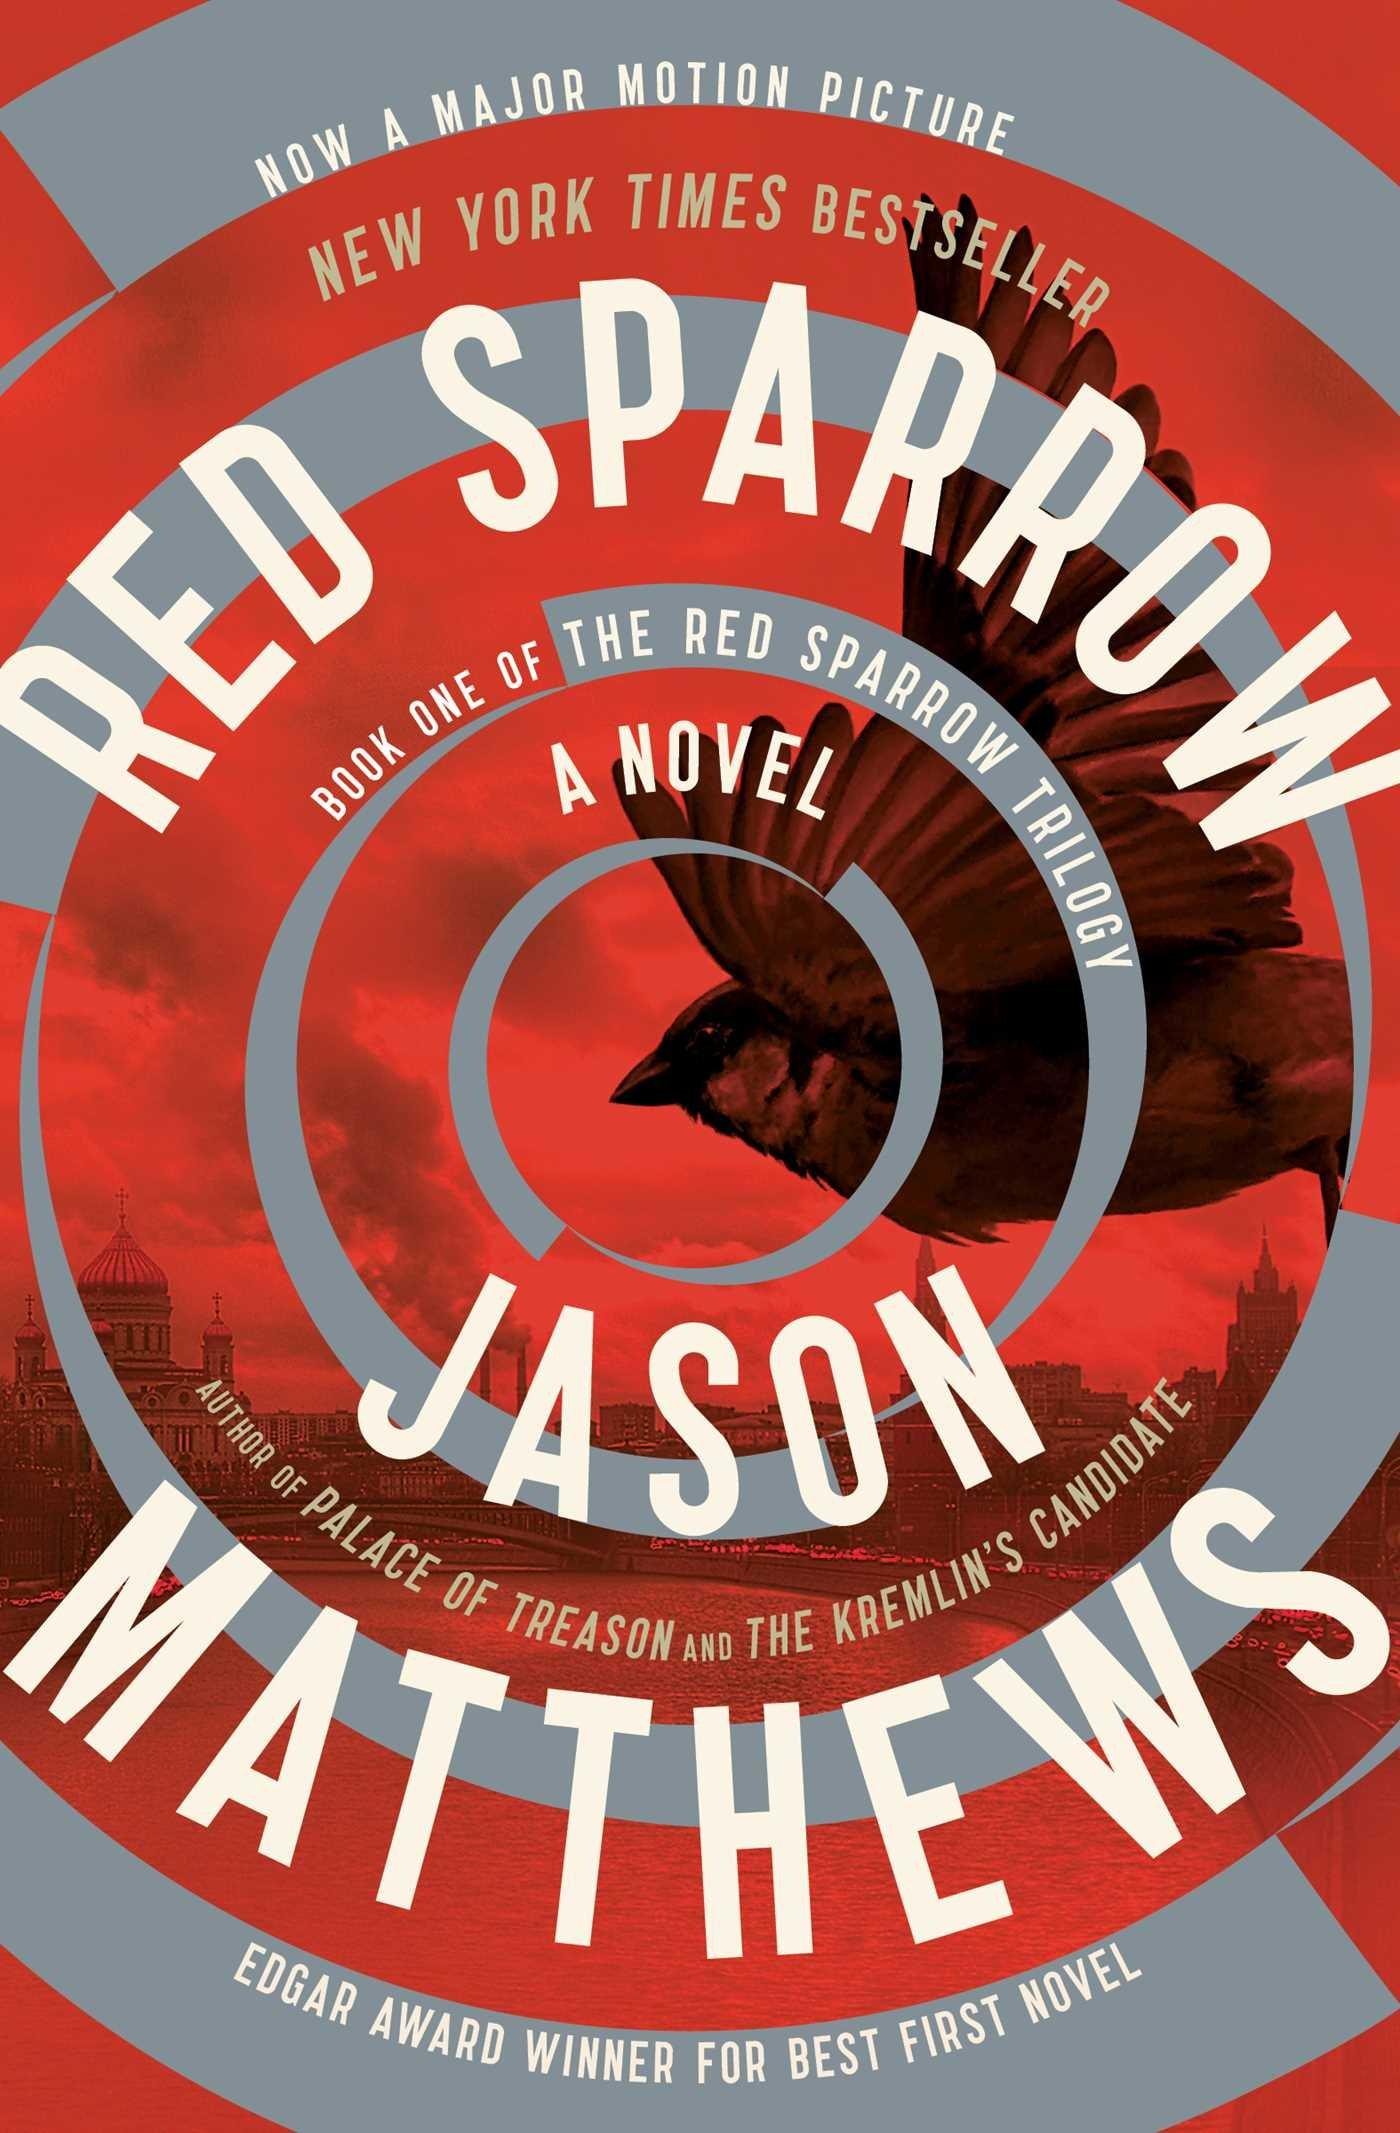 Red Sparrow: A Novel (1) (The Red Sparrow Trilogy): Matthews, Jason:  9781476706139: Amazon.com: Books